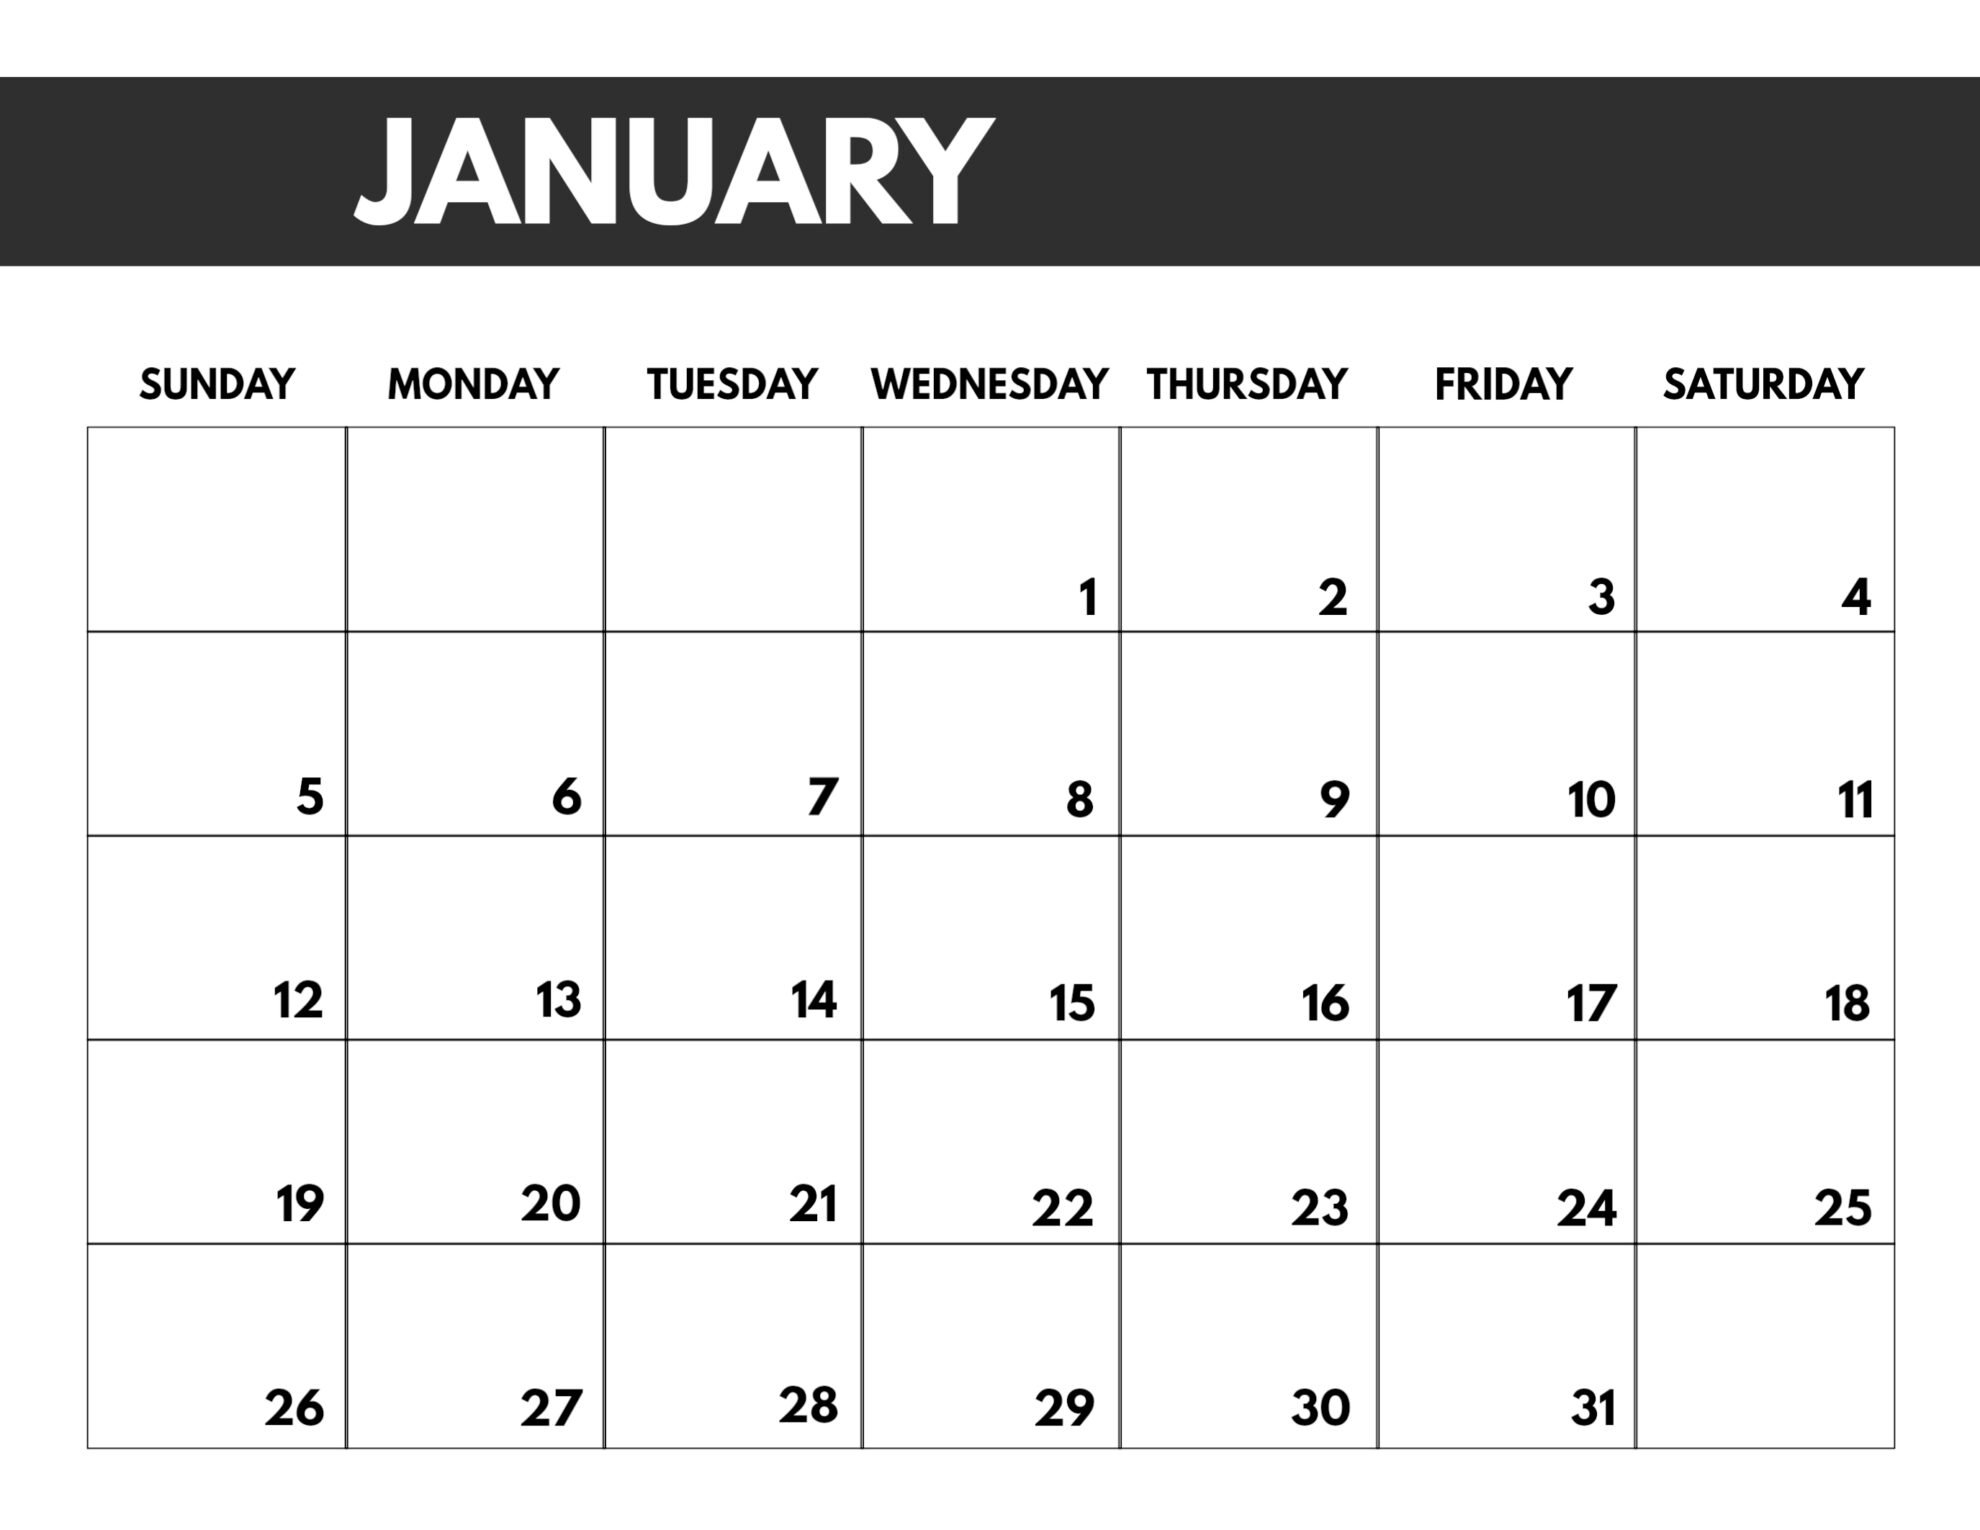 8.5 X 11 Printable Calendars - Calendar Inspiration Design Free 8.5 X 5.5 Printable Calendar